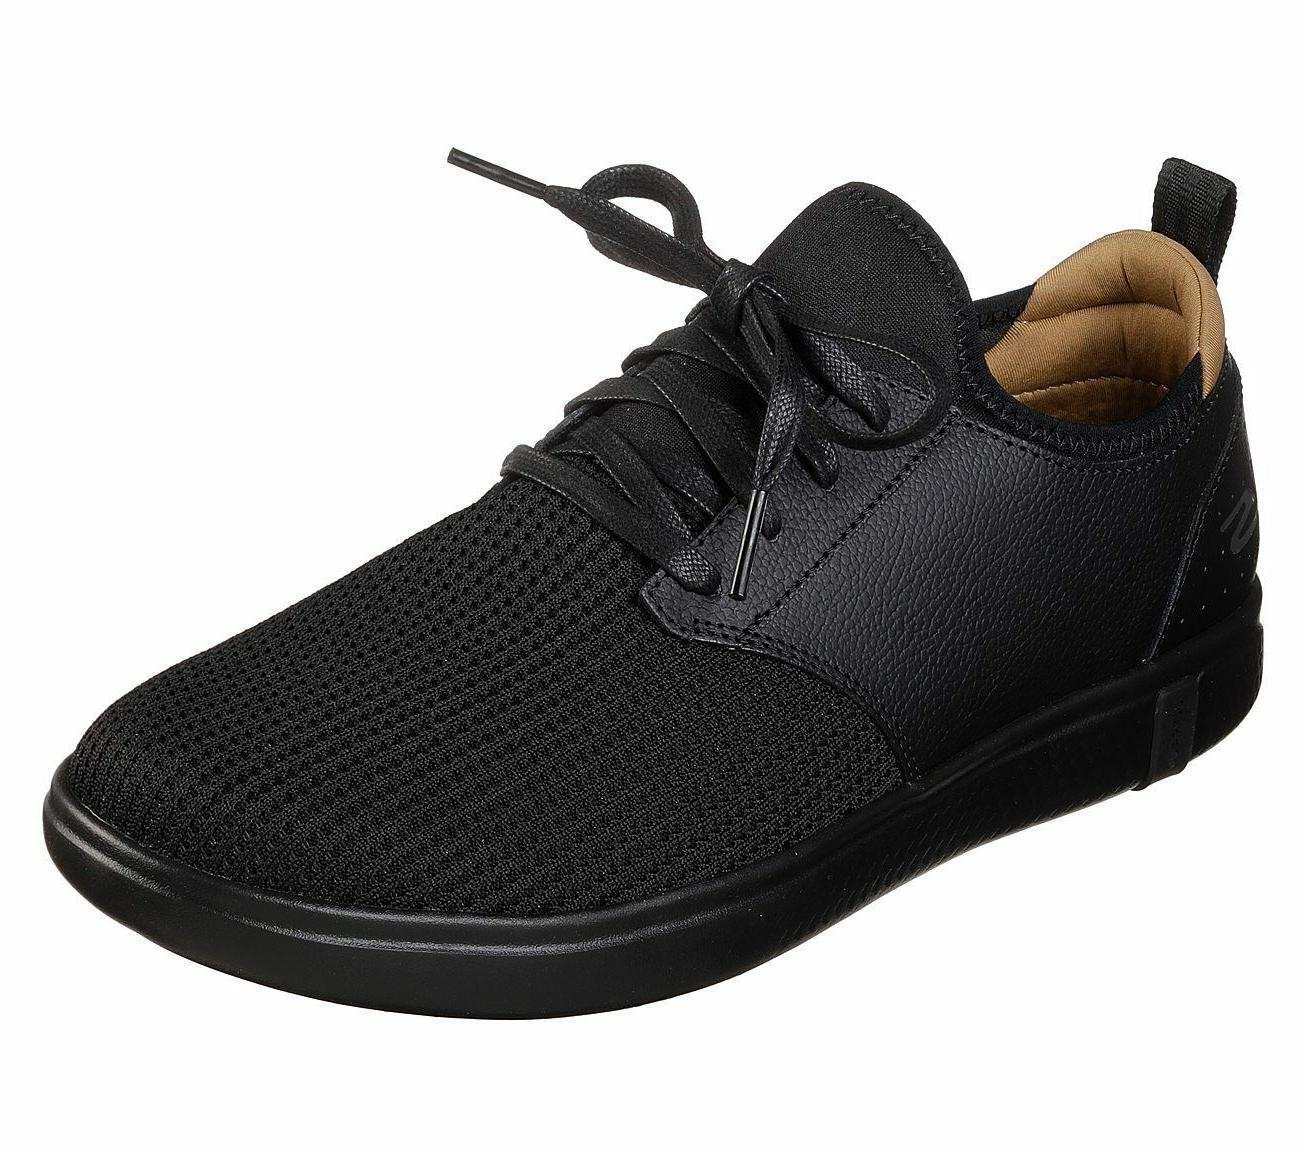 55461 black shoes men casual comfort go